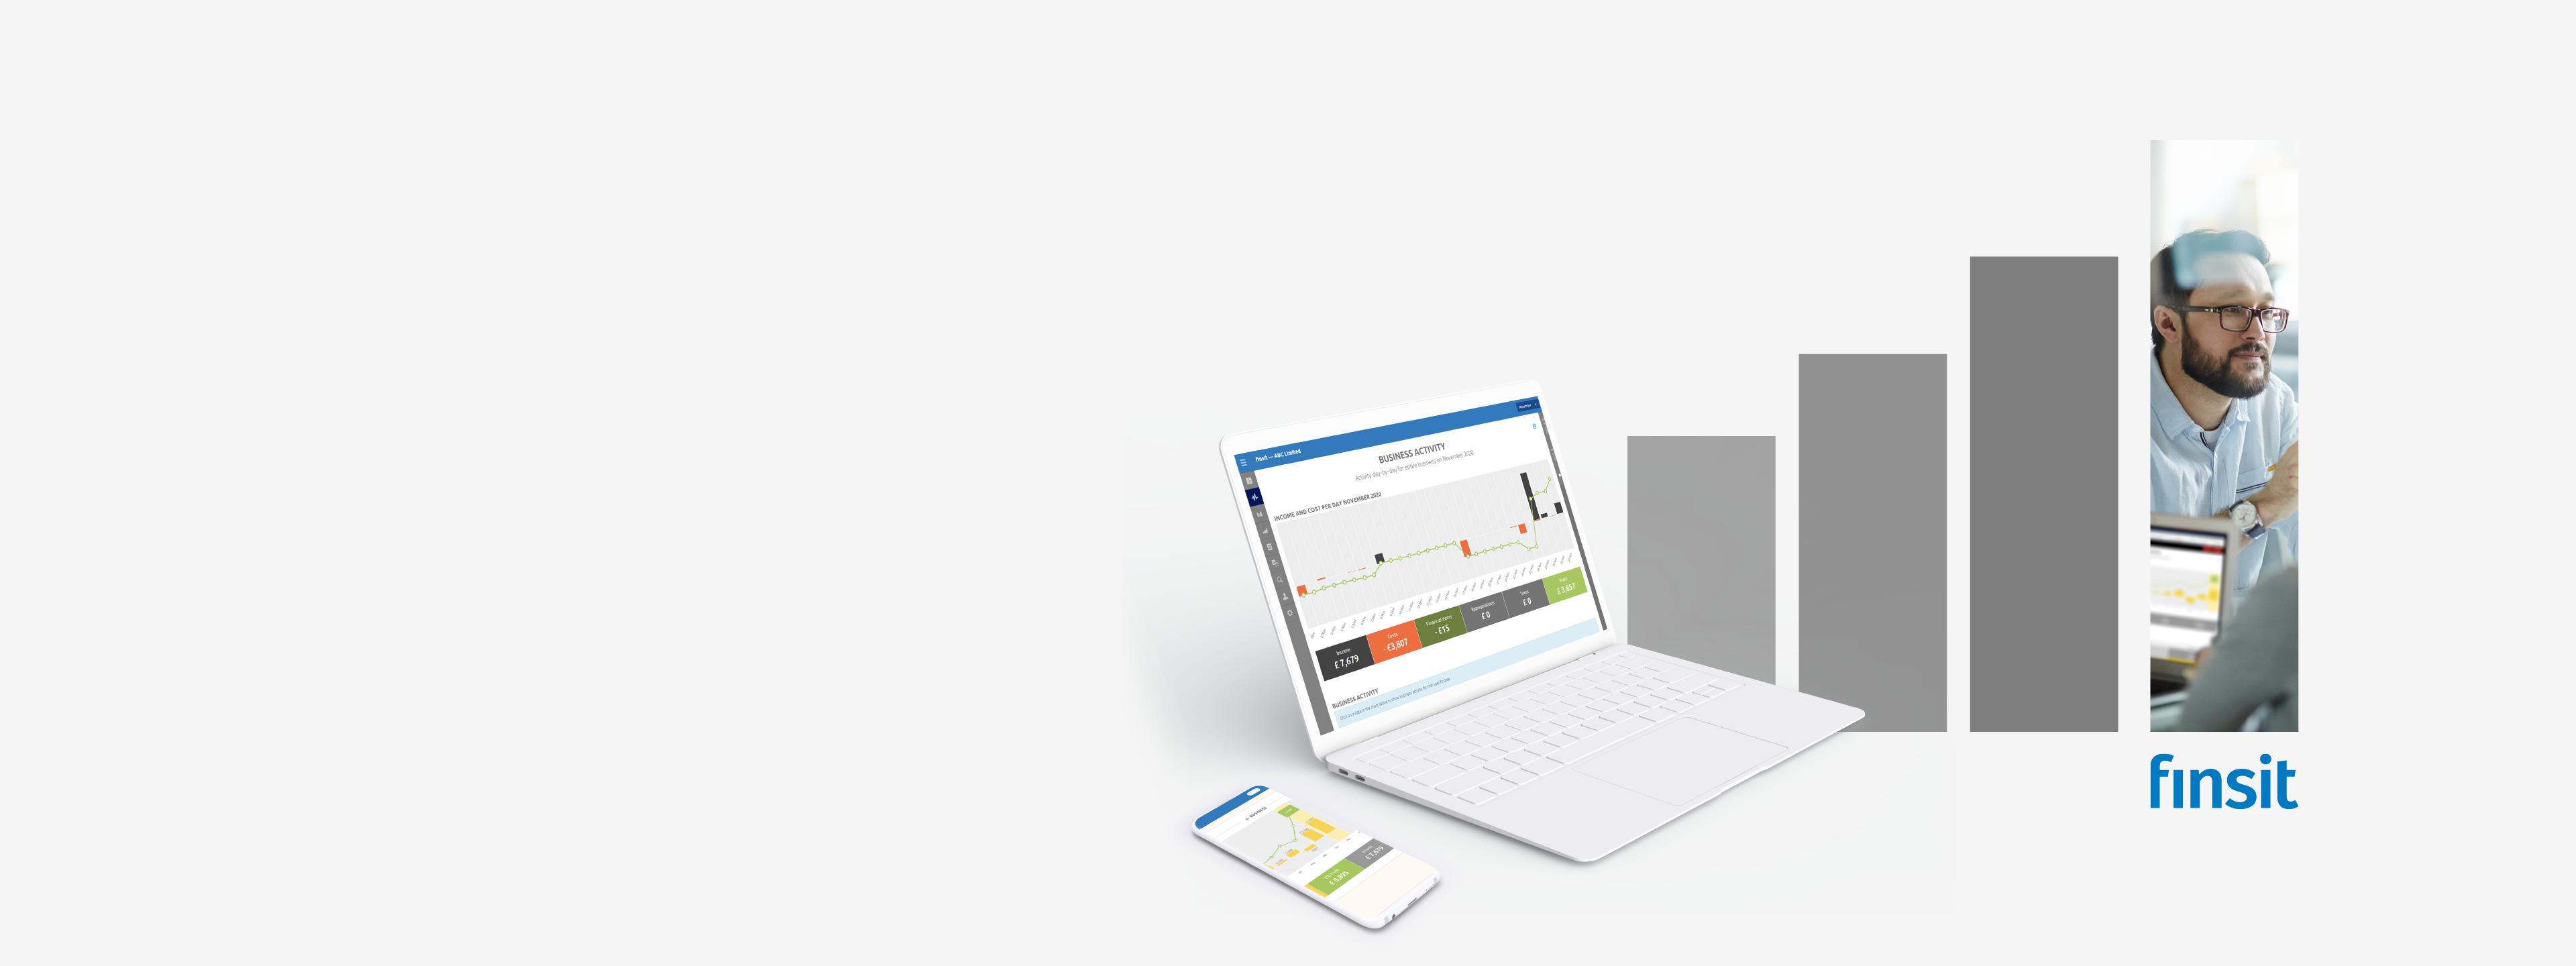 Finsit Cloud Financial Insights